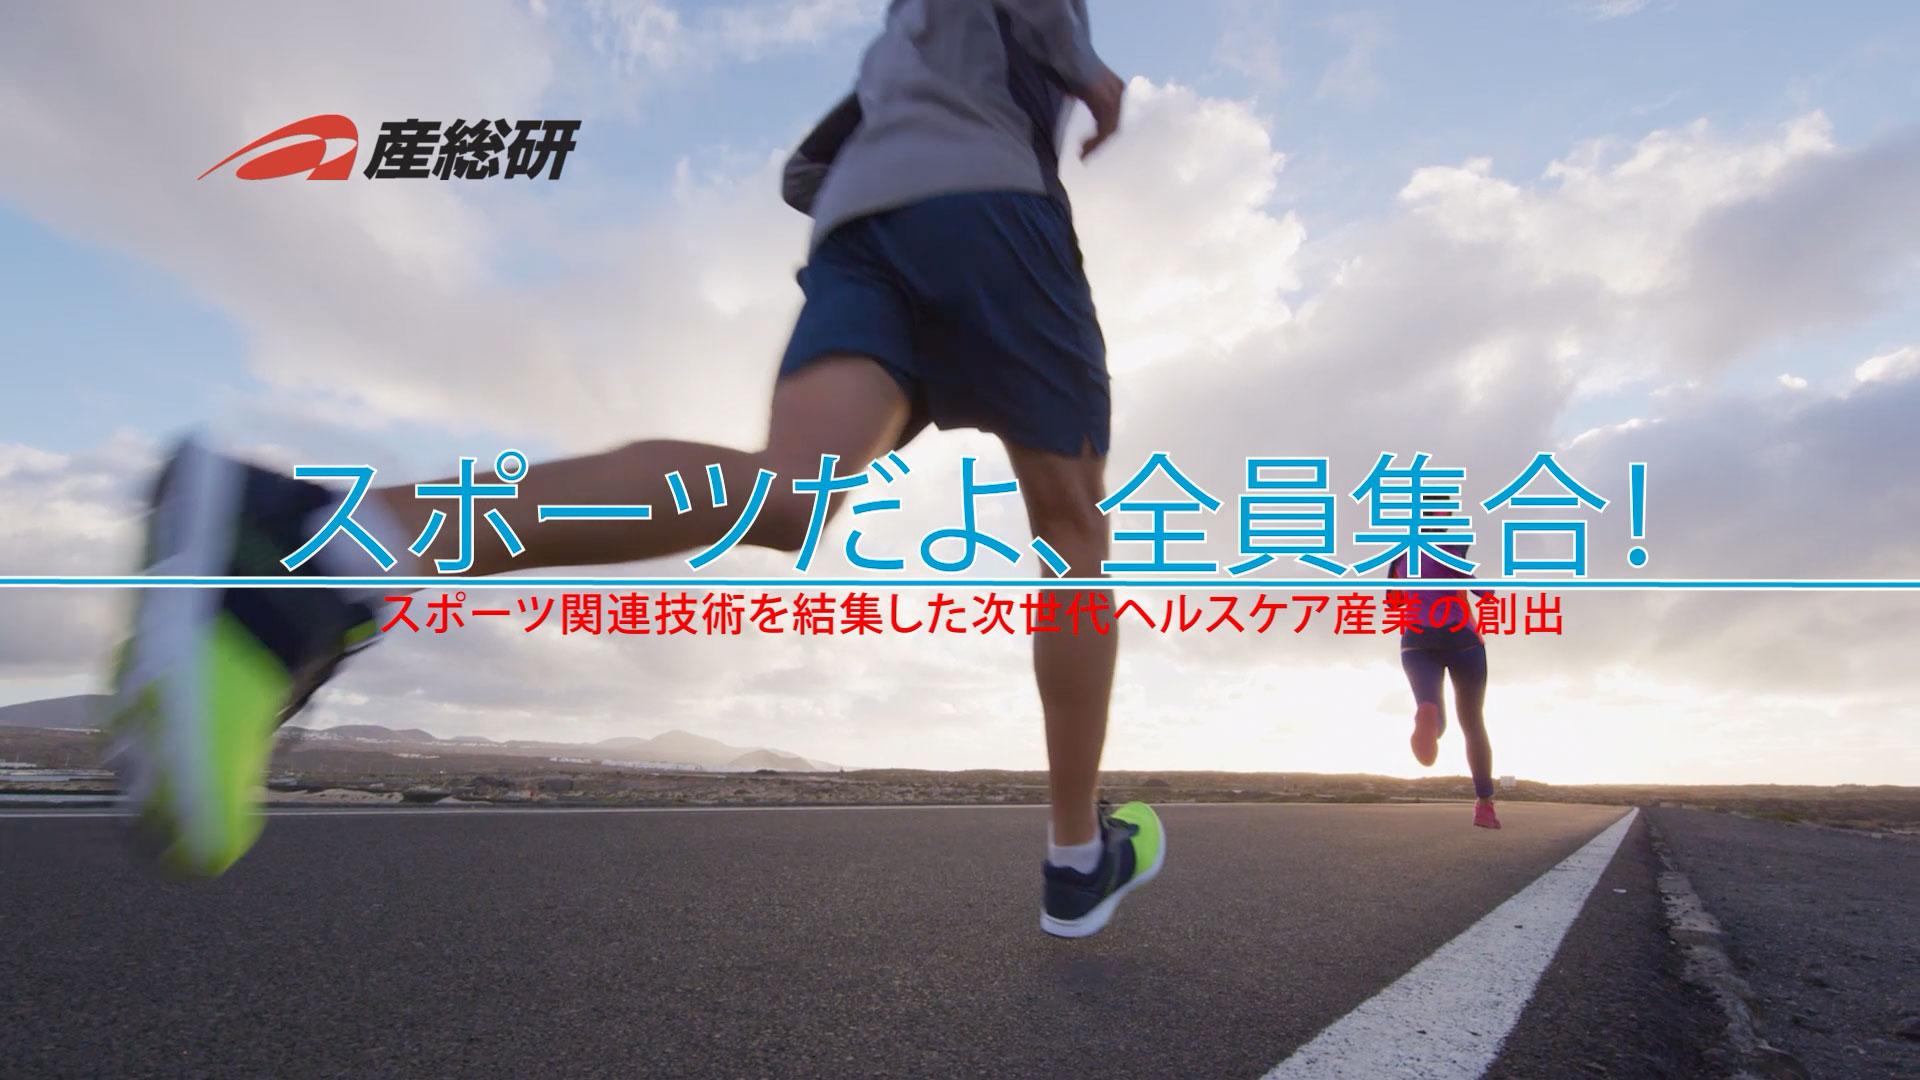 Sports_20200513_1